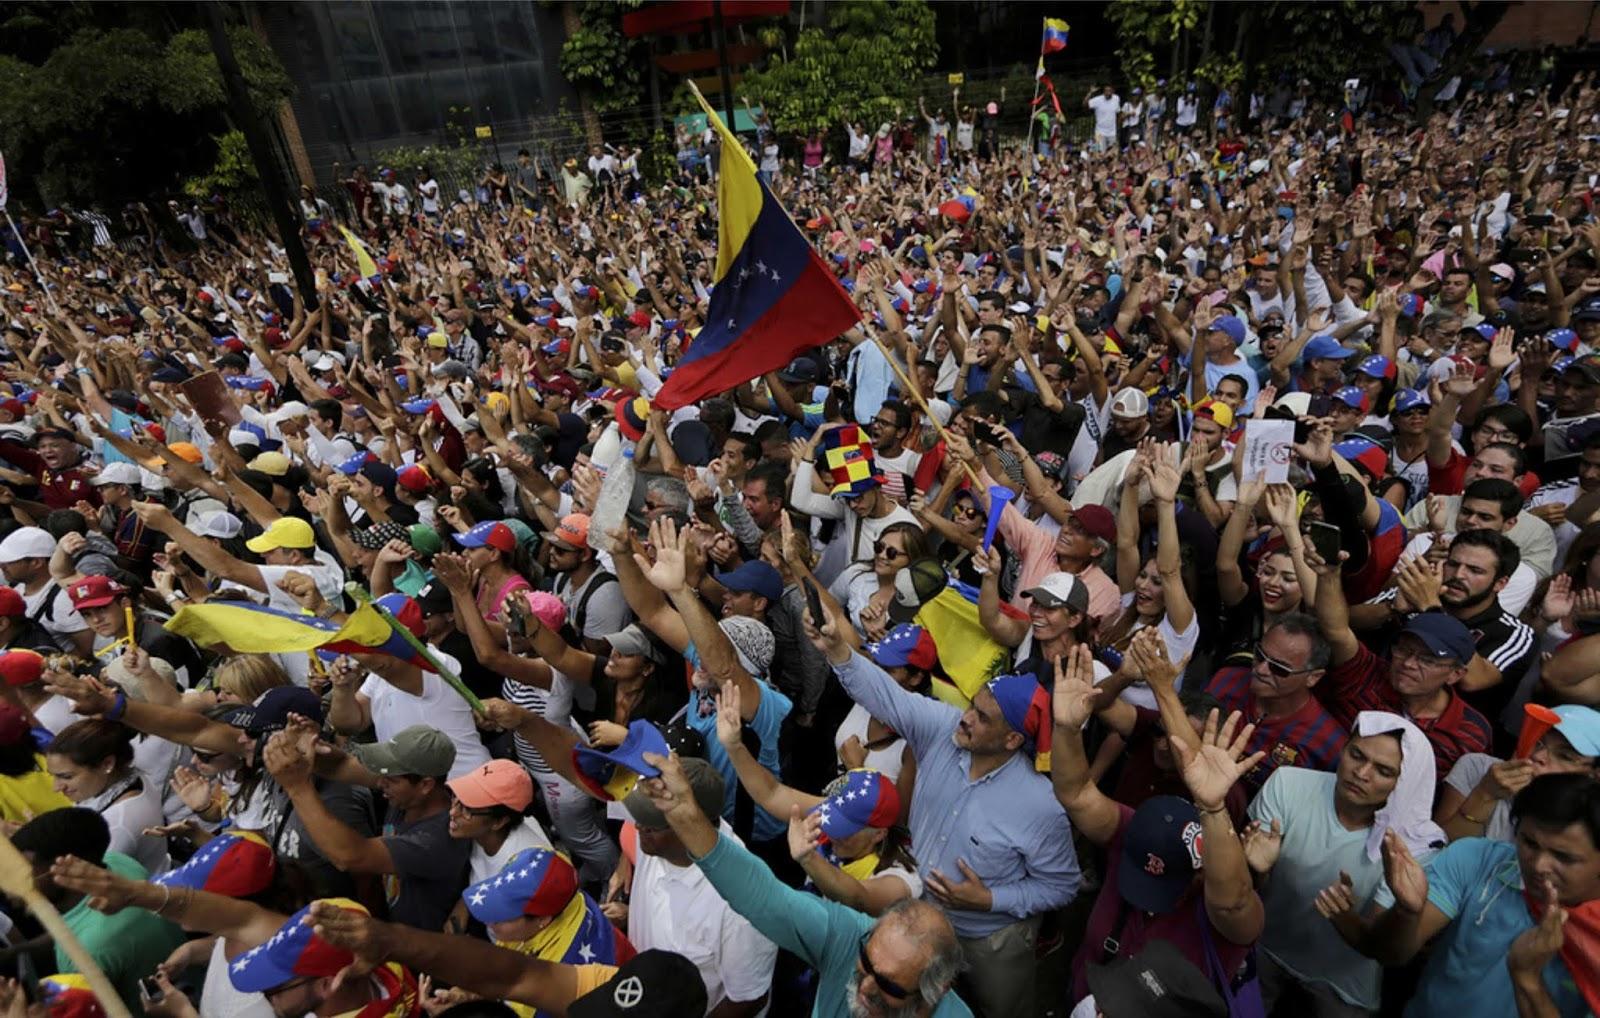 intervensi asing dalam urusan Venezuela dapat menyebabkan perang saudara